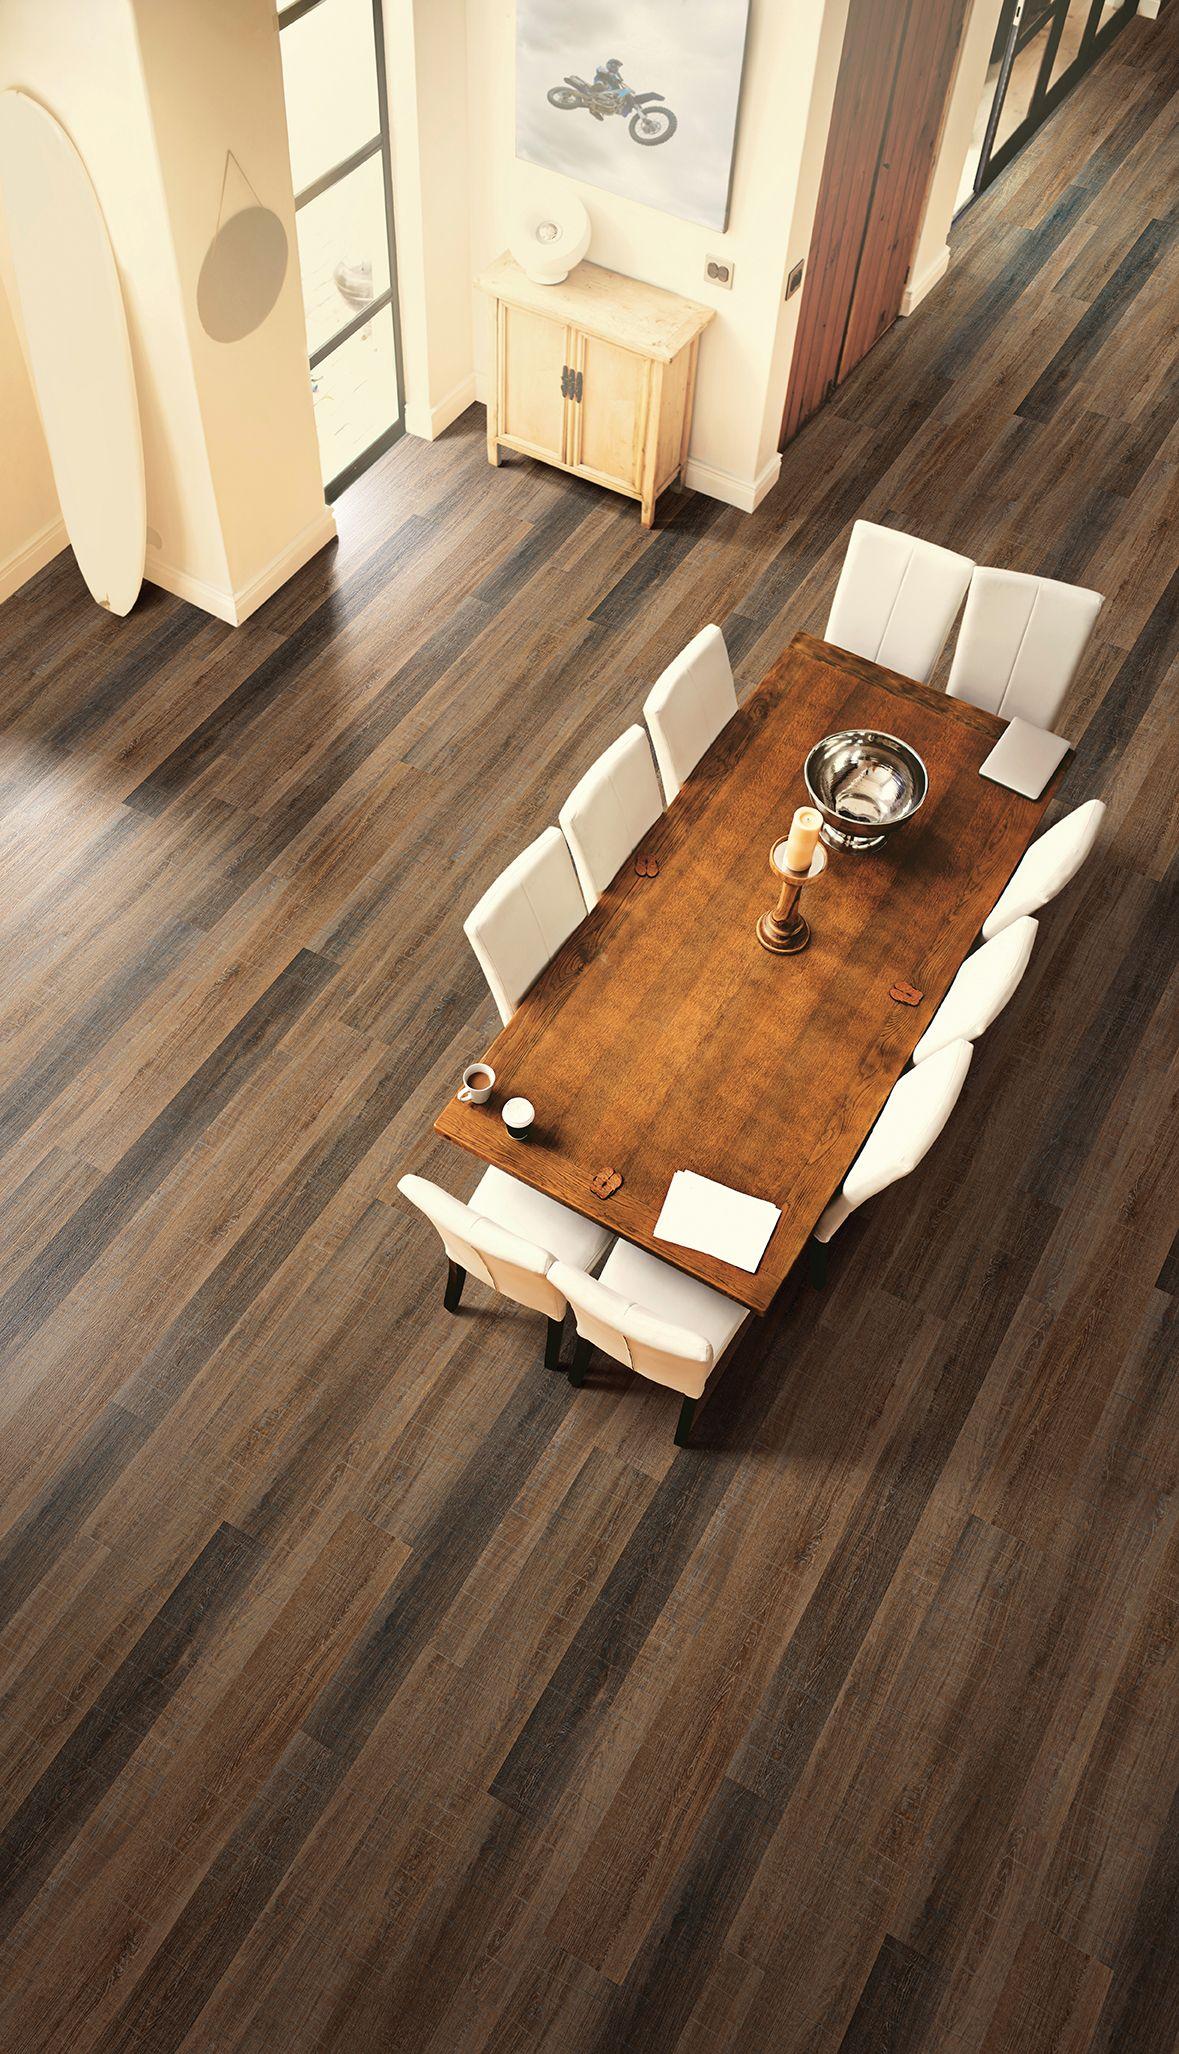 294513 Artfulbeaulieu America Capell Flooring And